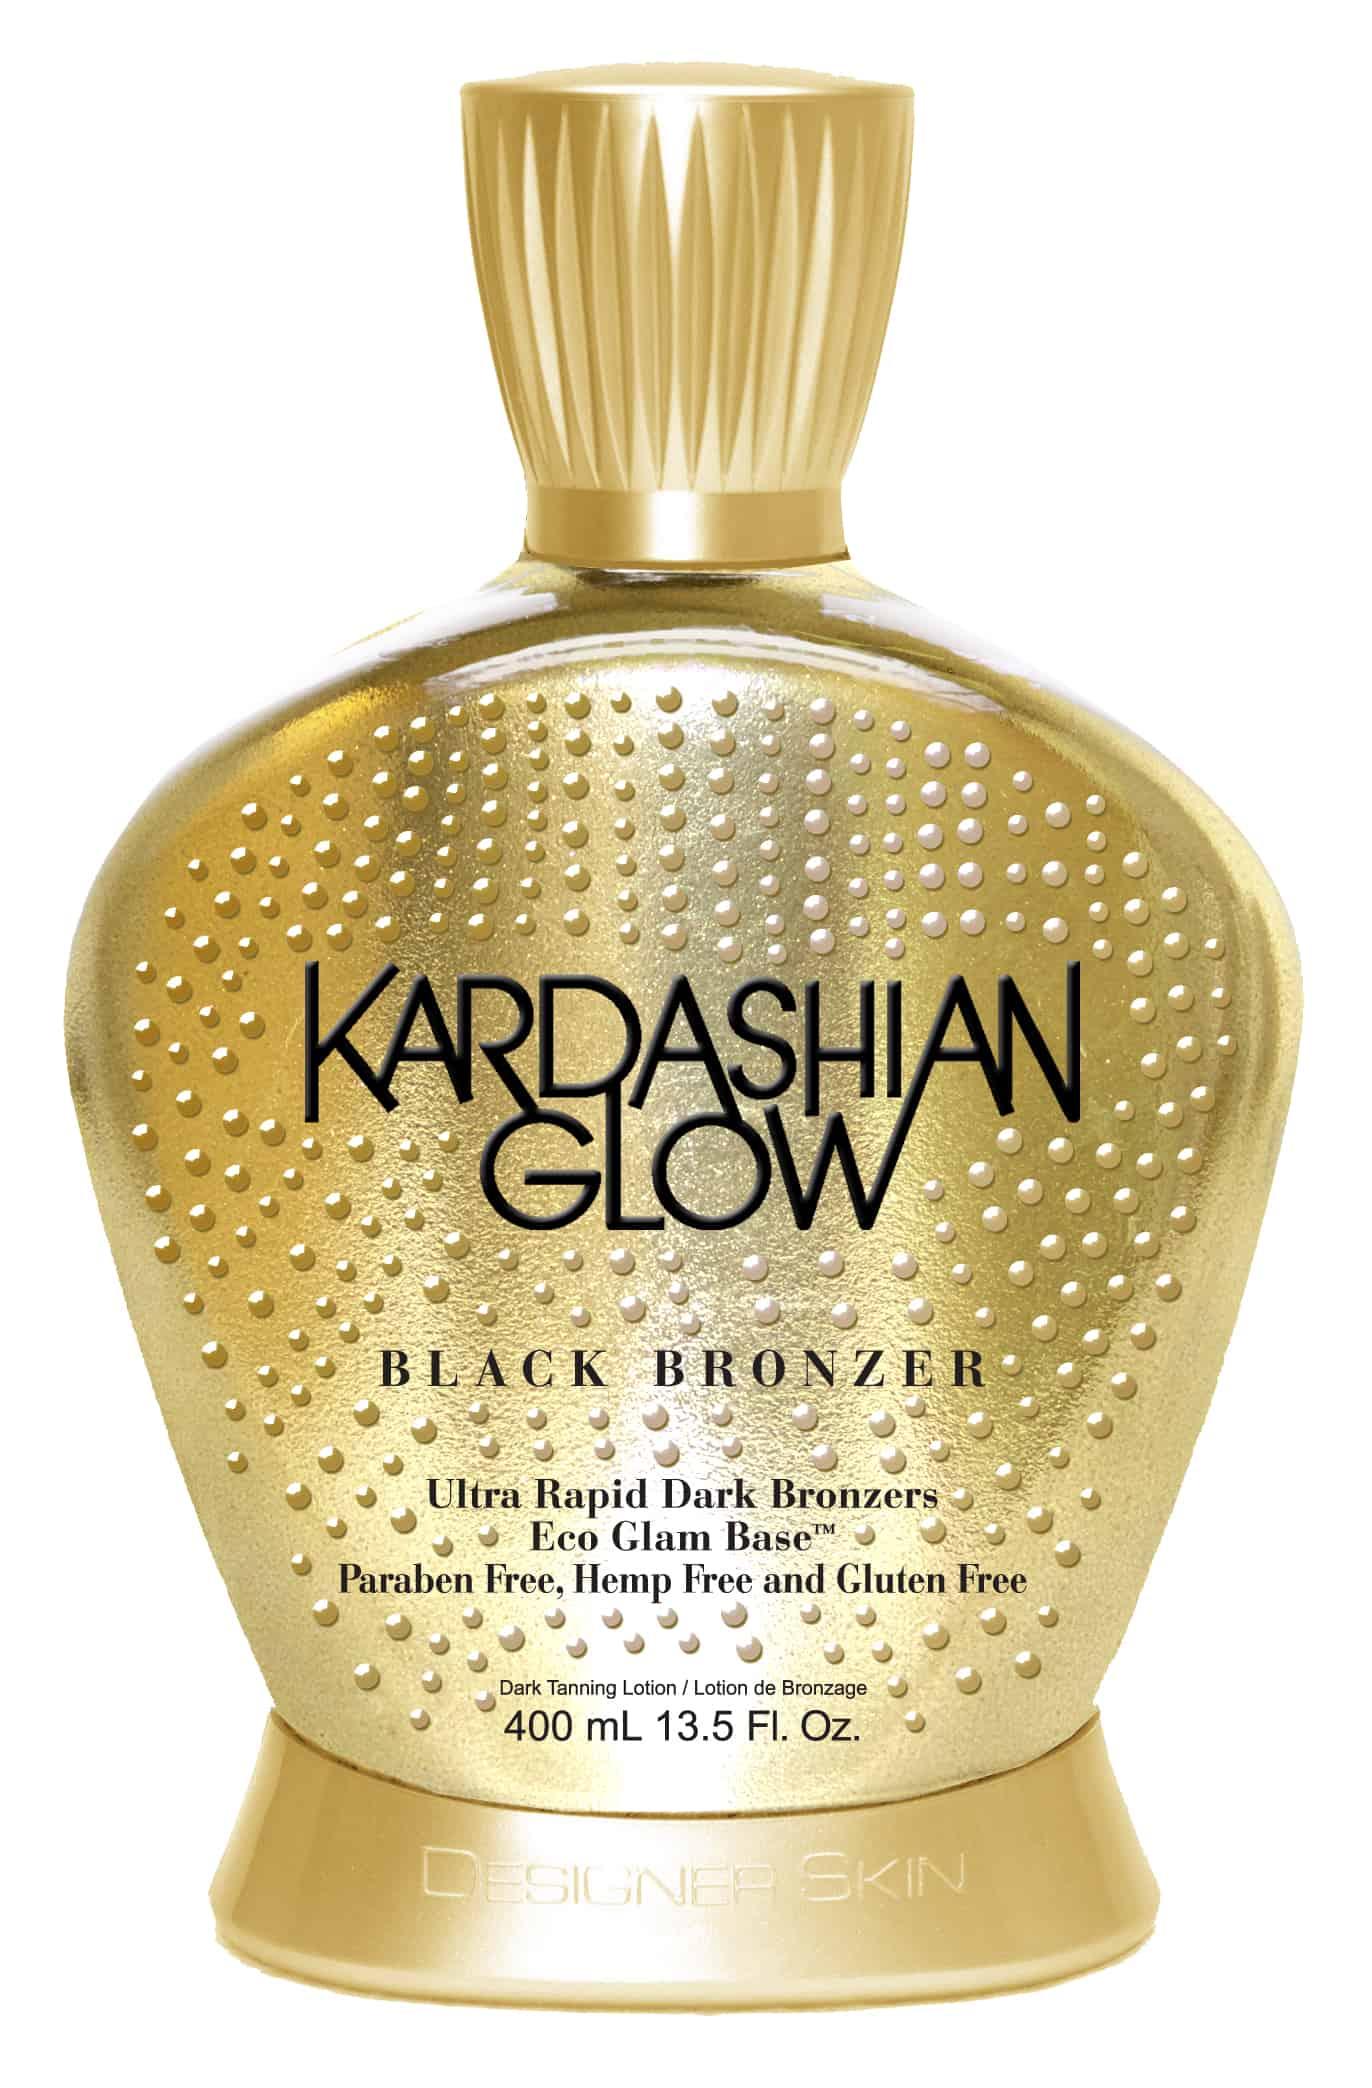 Kardashian Glow by Australian Gold , perfetto per un'abbronzatura da star!